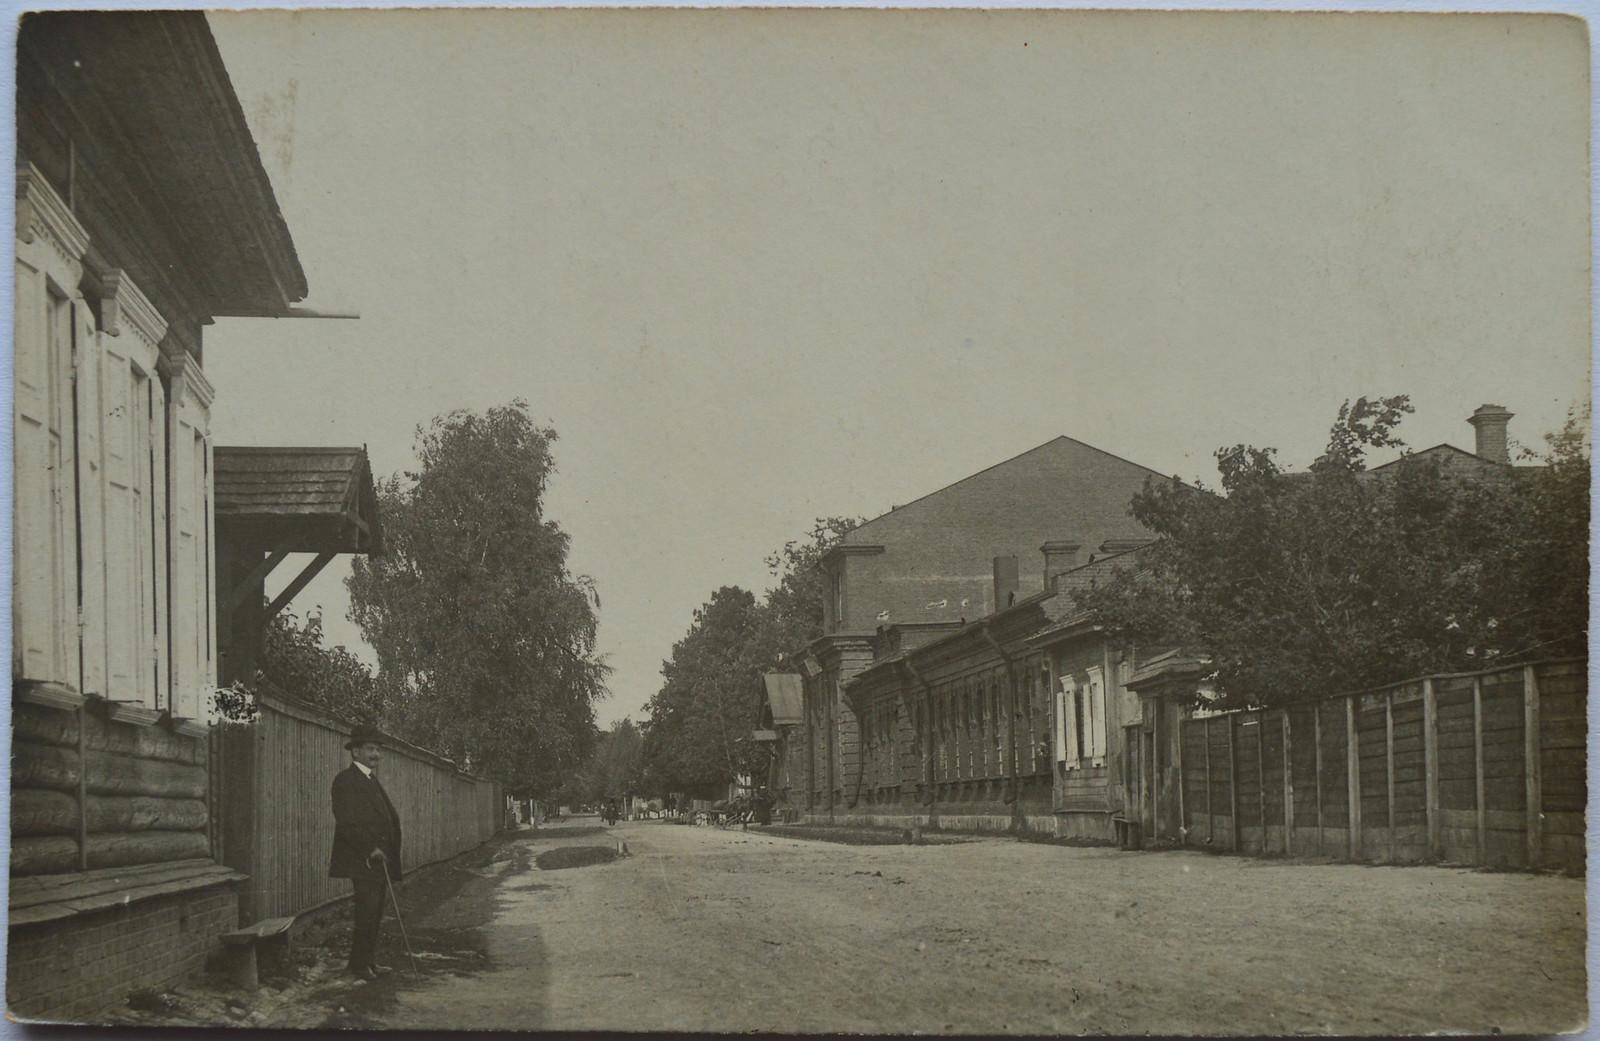 Ново-Чашницкая улица. Земская управа